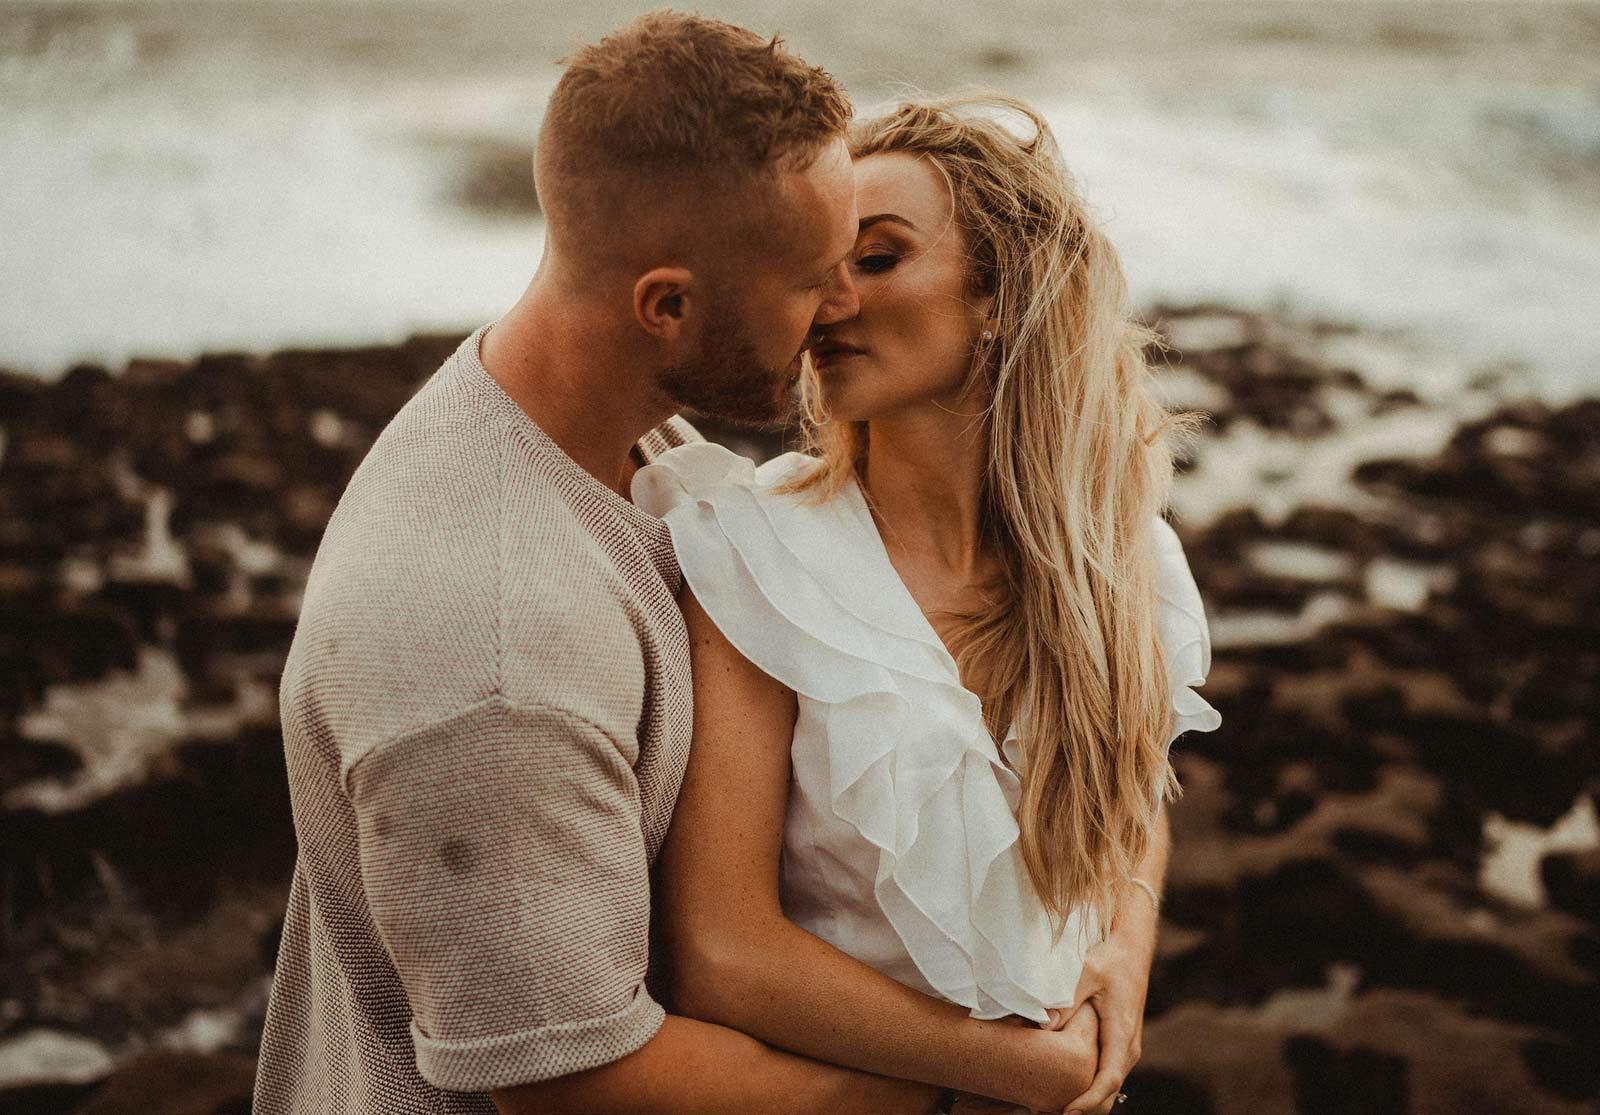 A couple kiss on the beach - close up photo